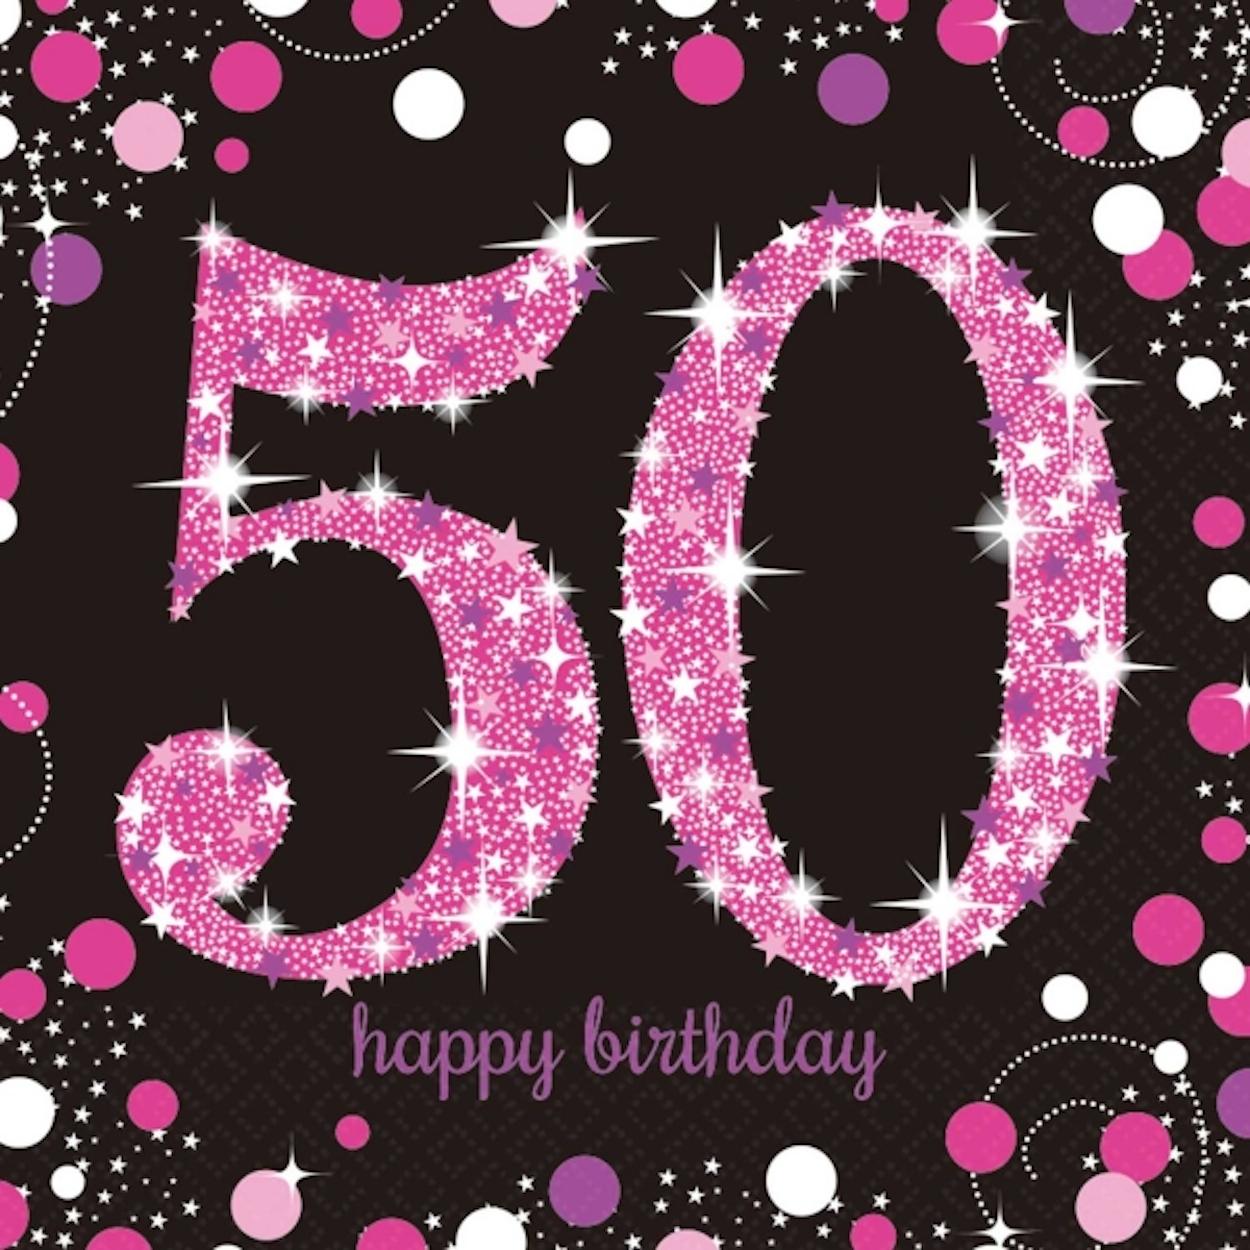 16 X Pink Celebration Age 50 Napkins Black 50th Birthday FREE PP